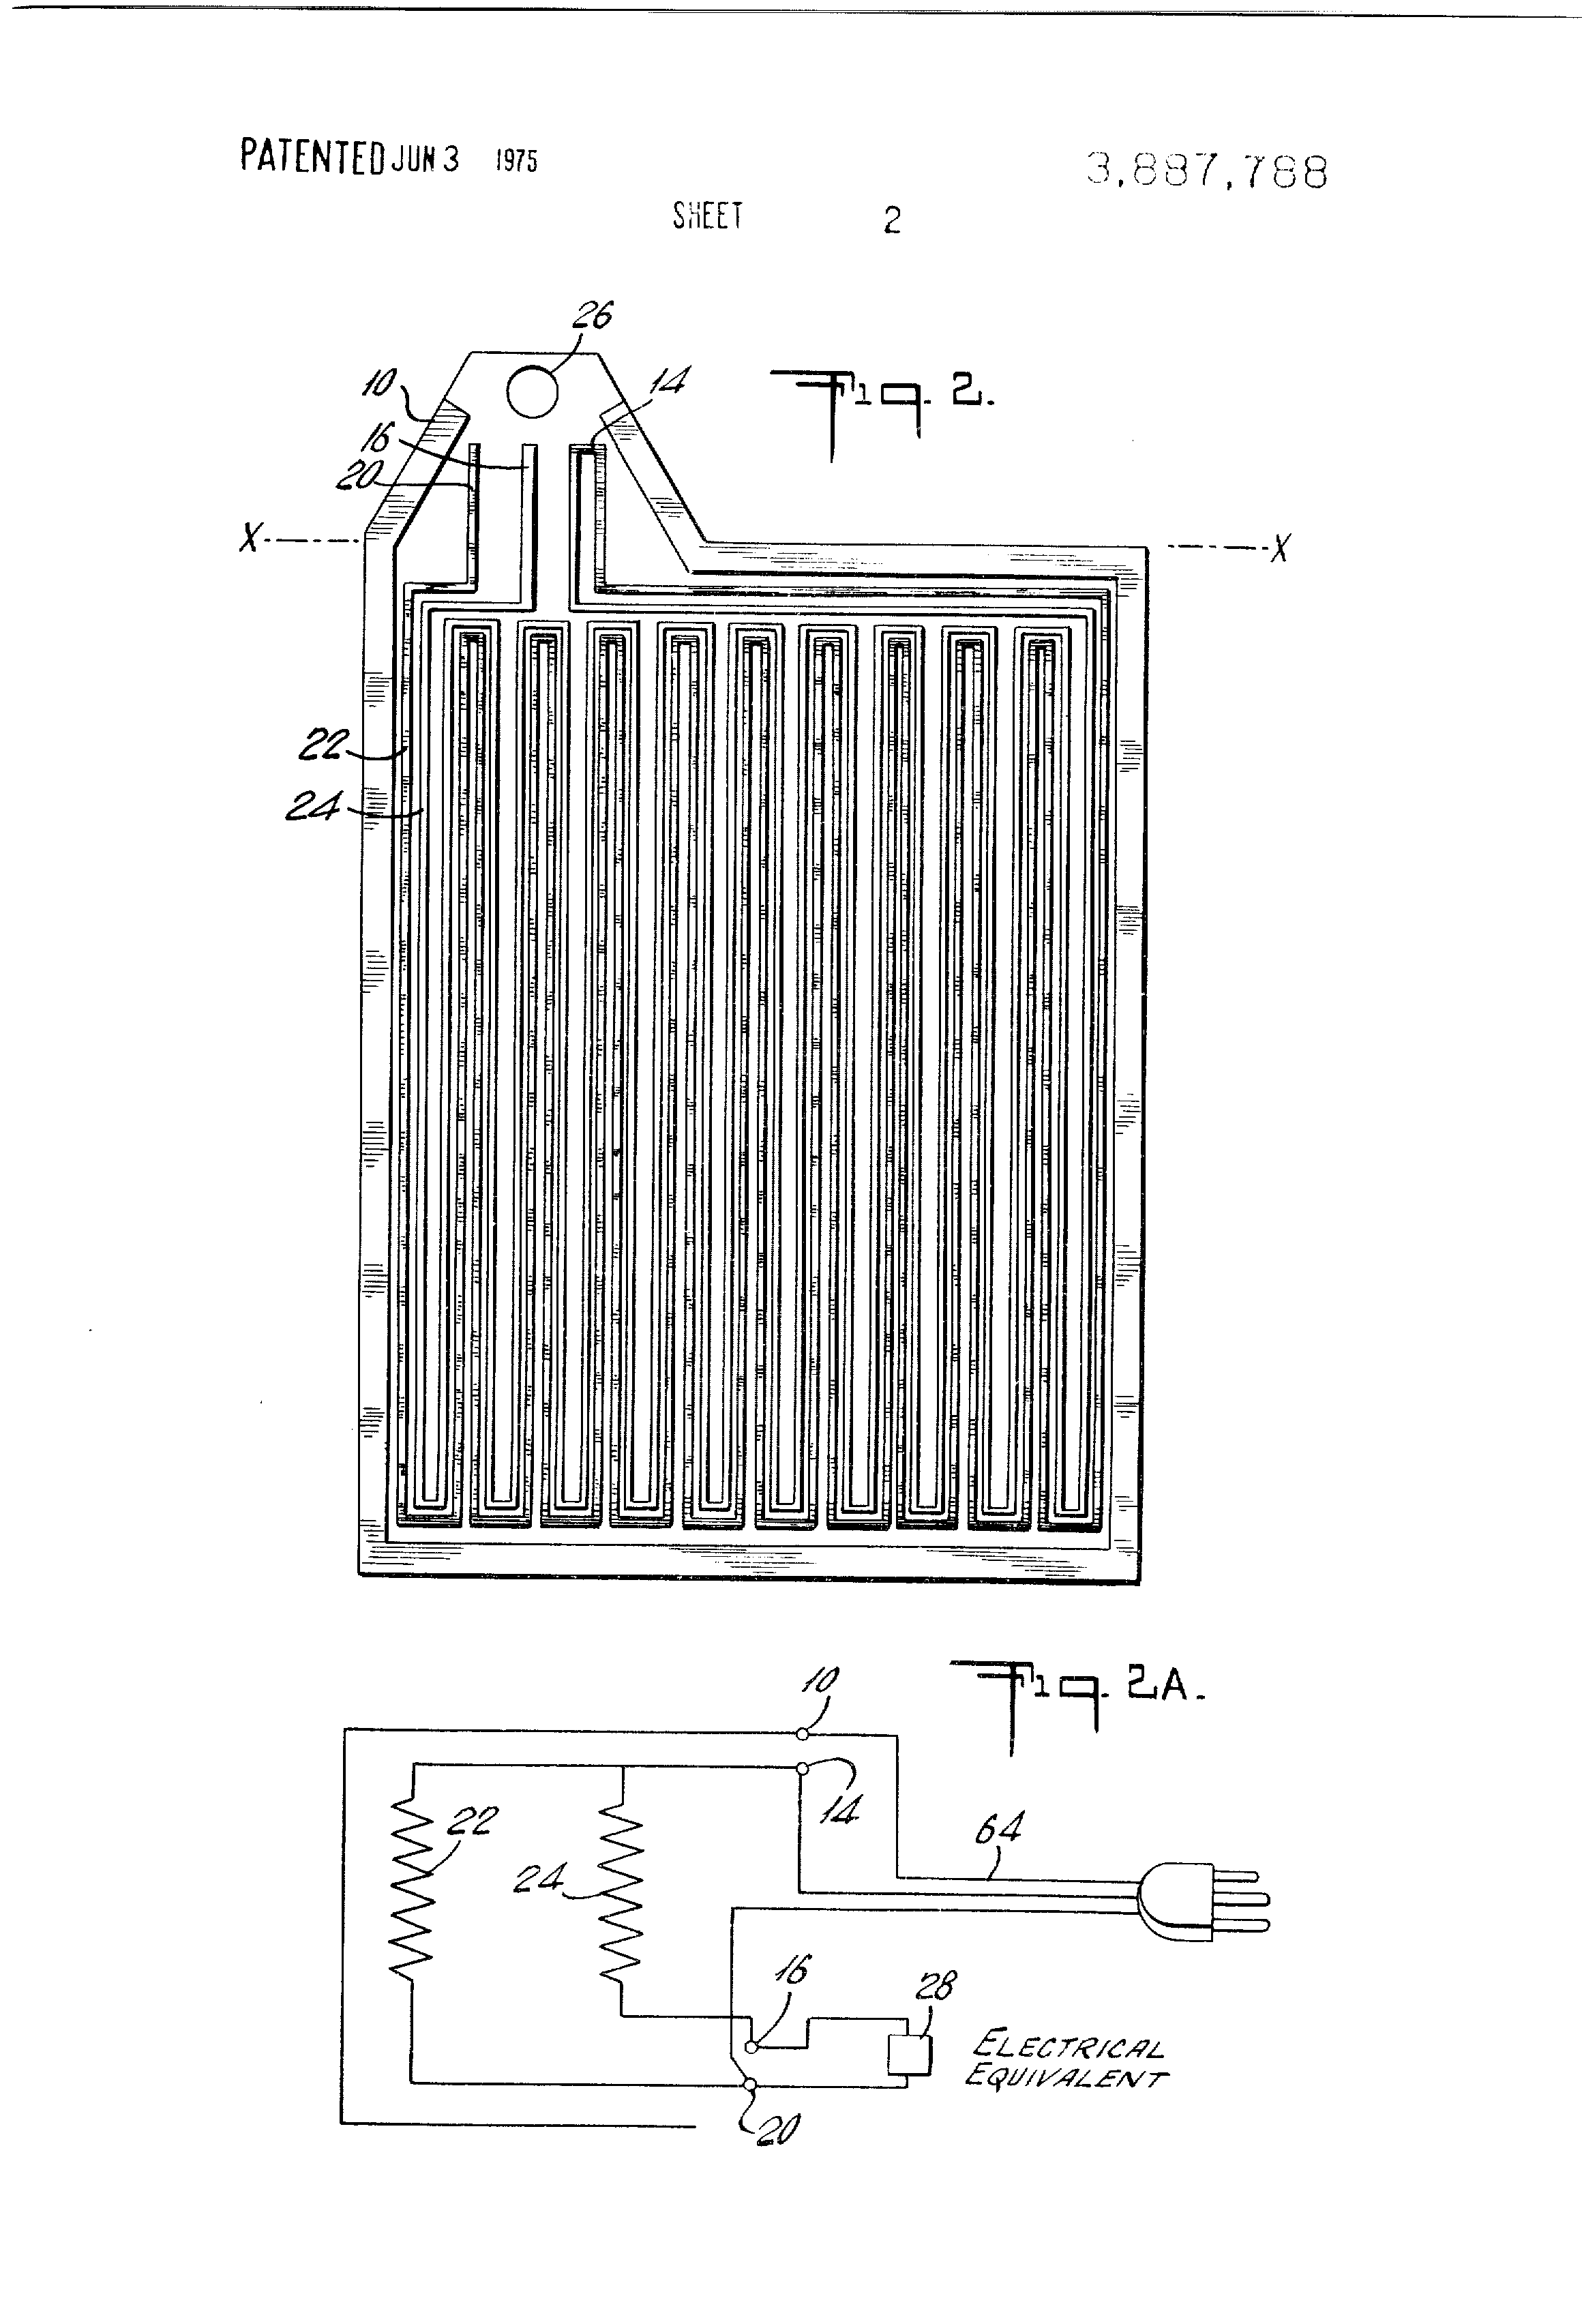 Sprague Wiring Diagram Heated Mirrors Posts Electrical Nissan Titan Patent Us3887788 Condensation Free Mirror Google Patents